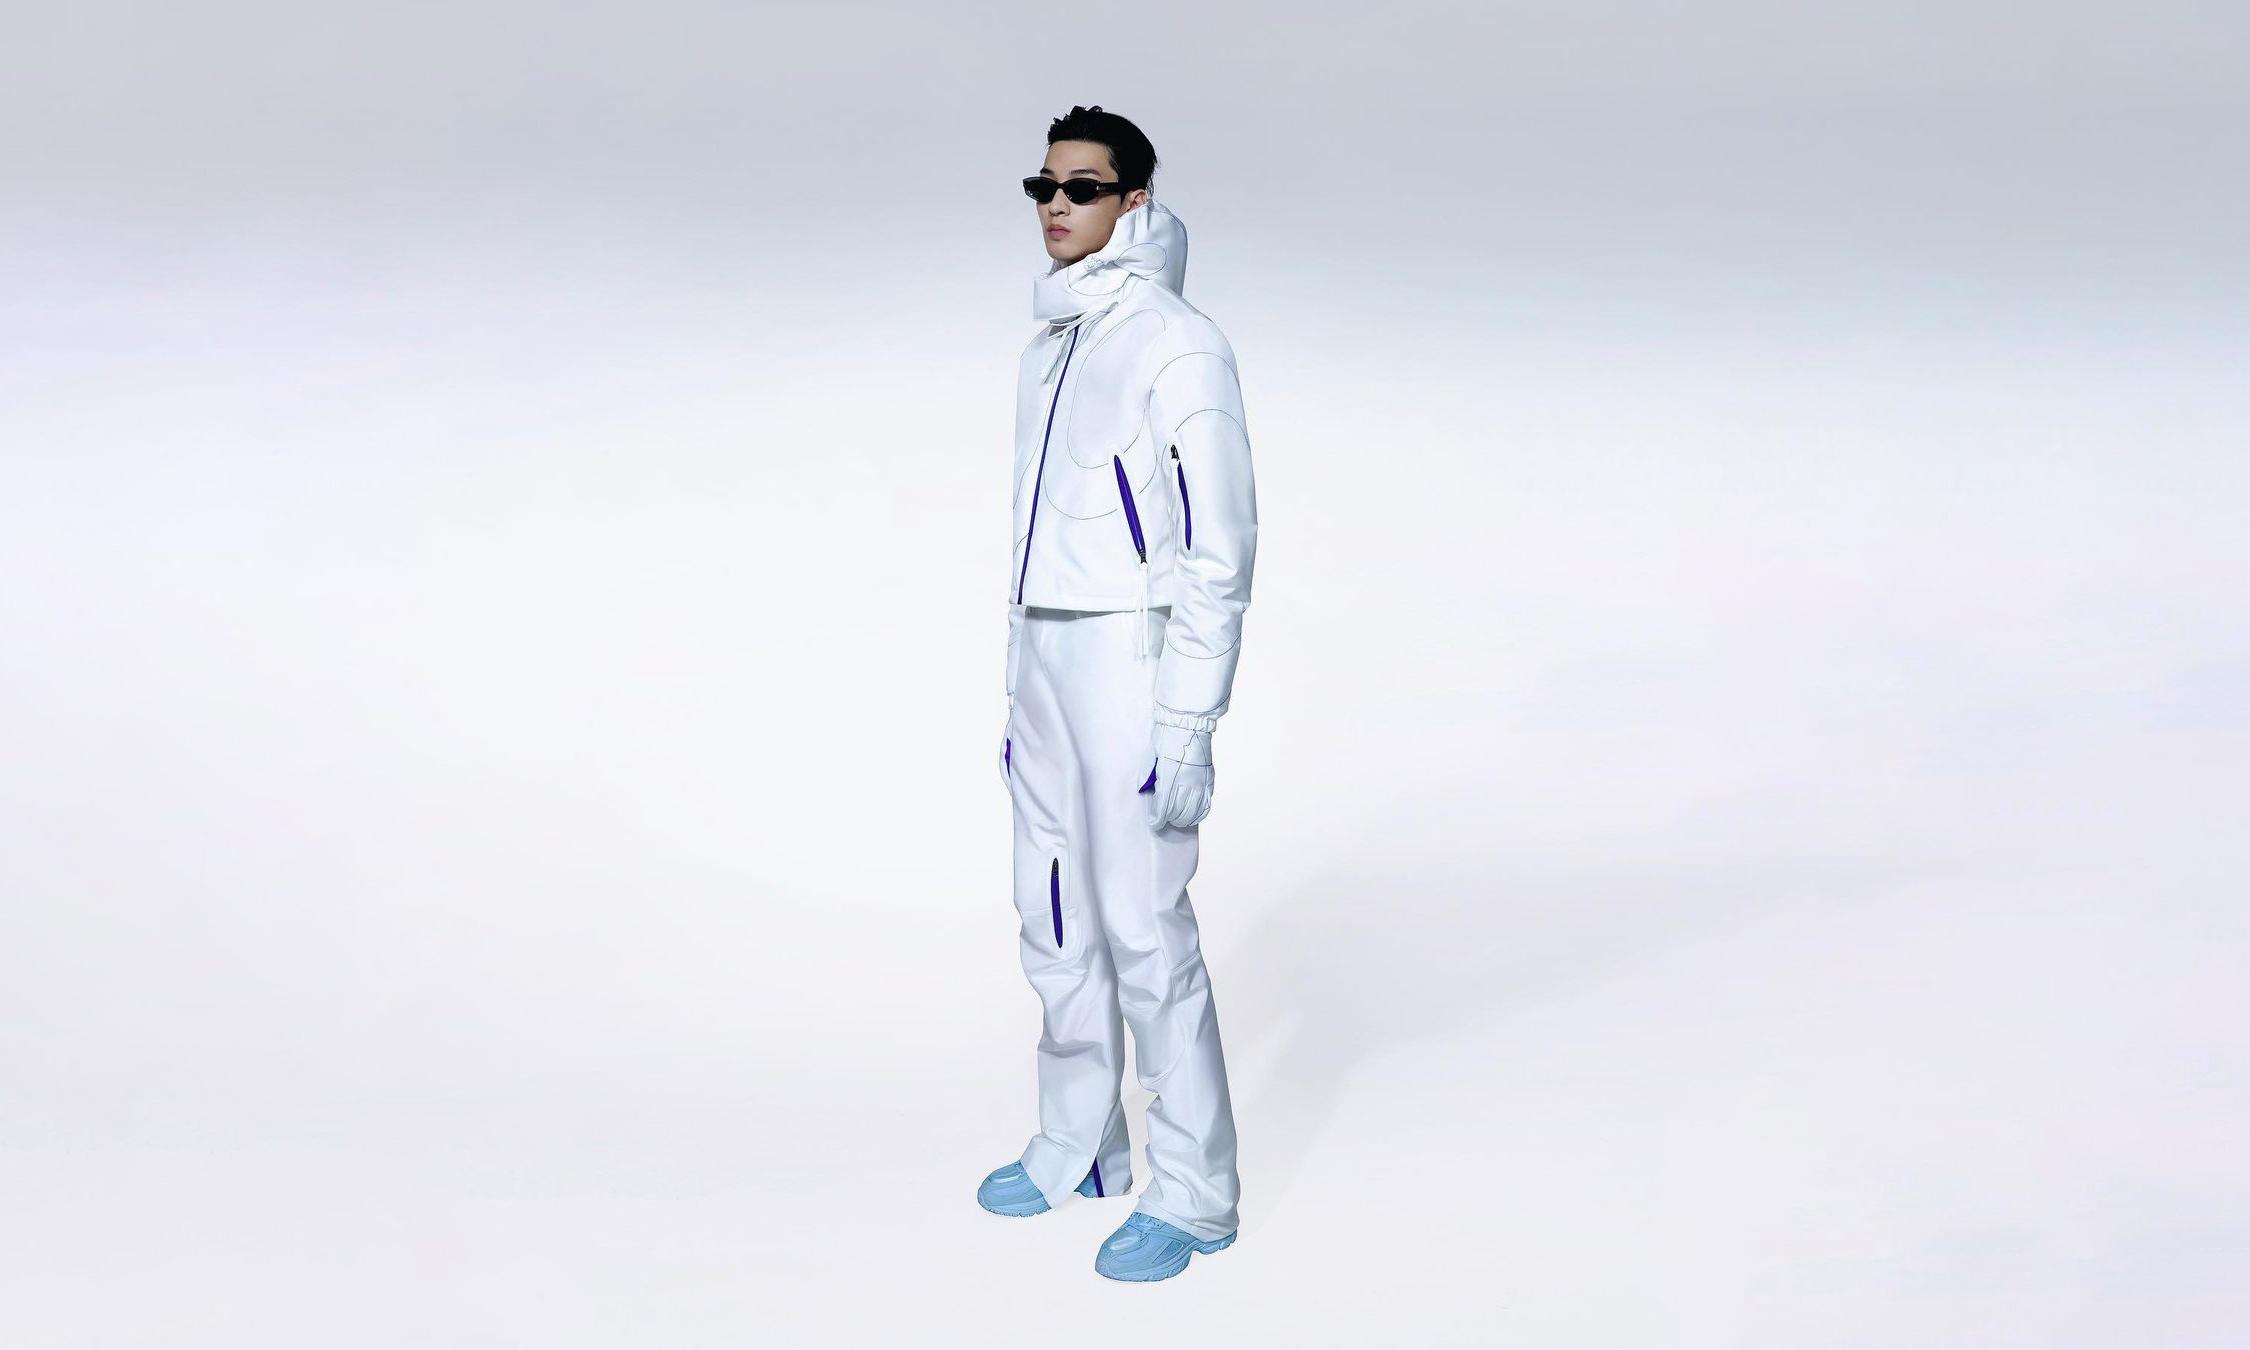 KANGHYUK x HYOSUNG 01 合作滑雪系列公布